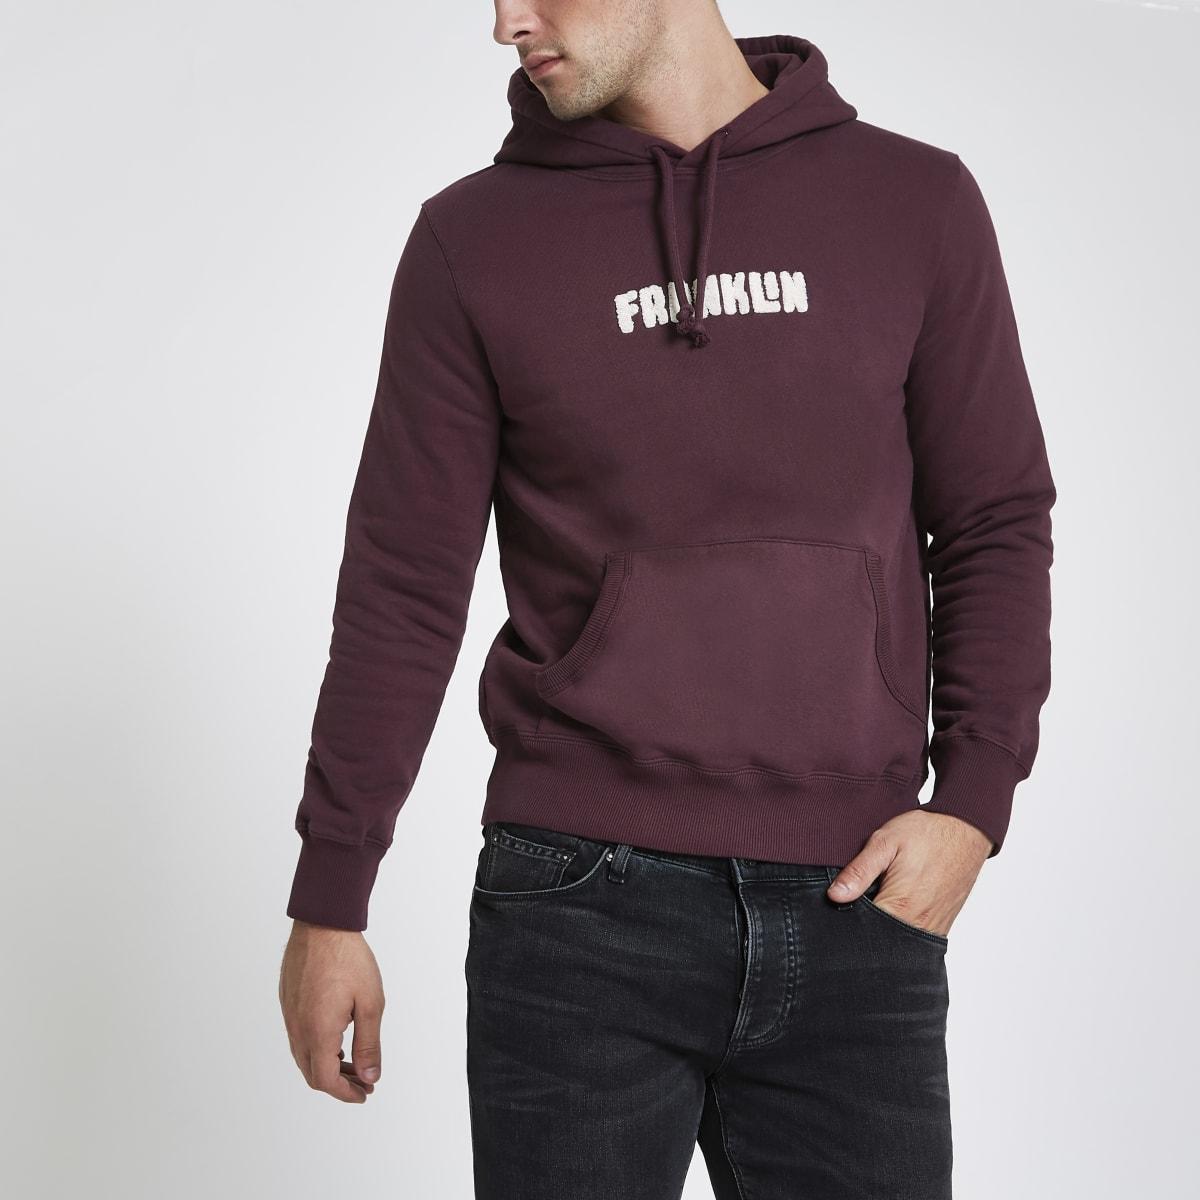 Franklin & Marshall burgundy hoodie